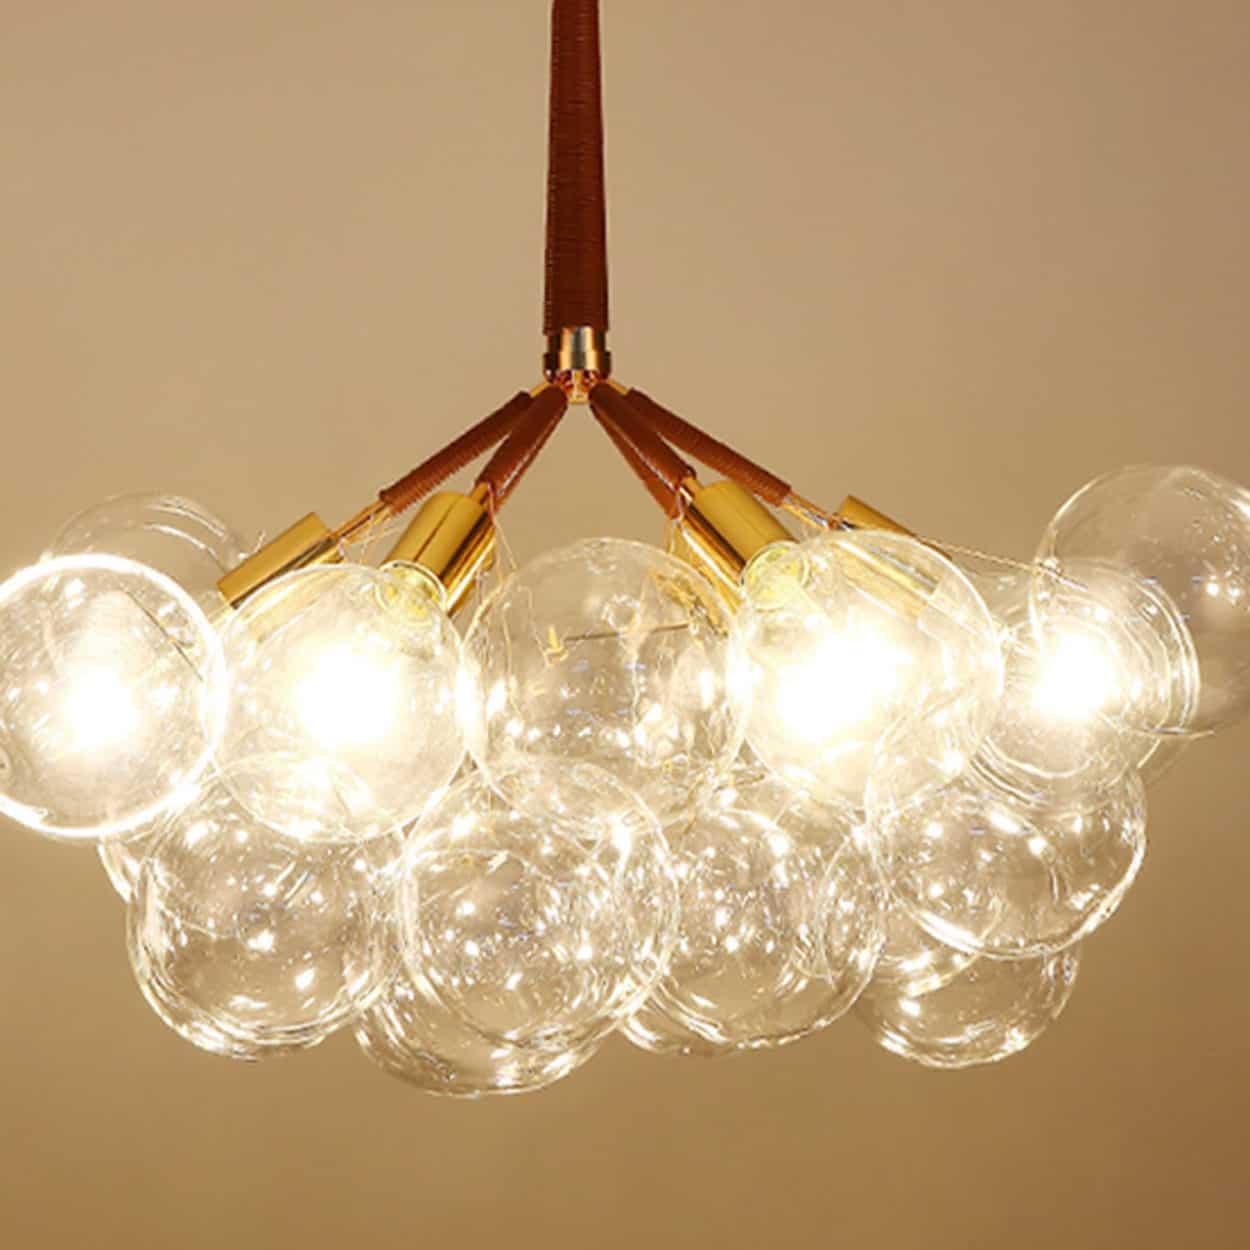 Doorana modern glass balls bubble chandelier lamp